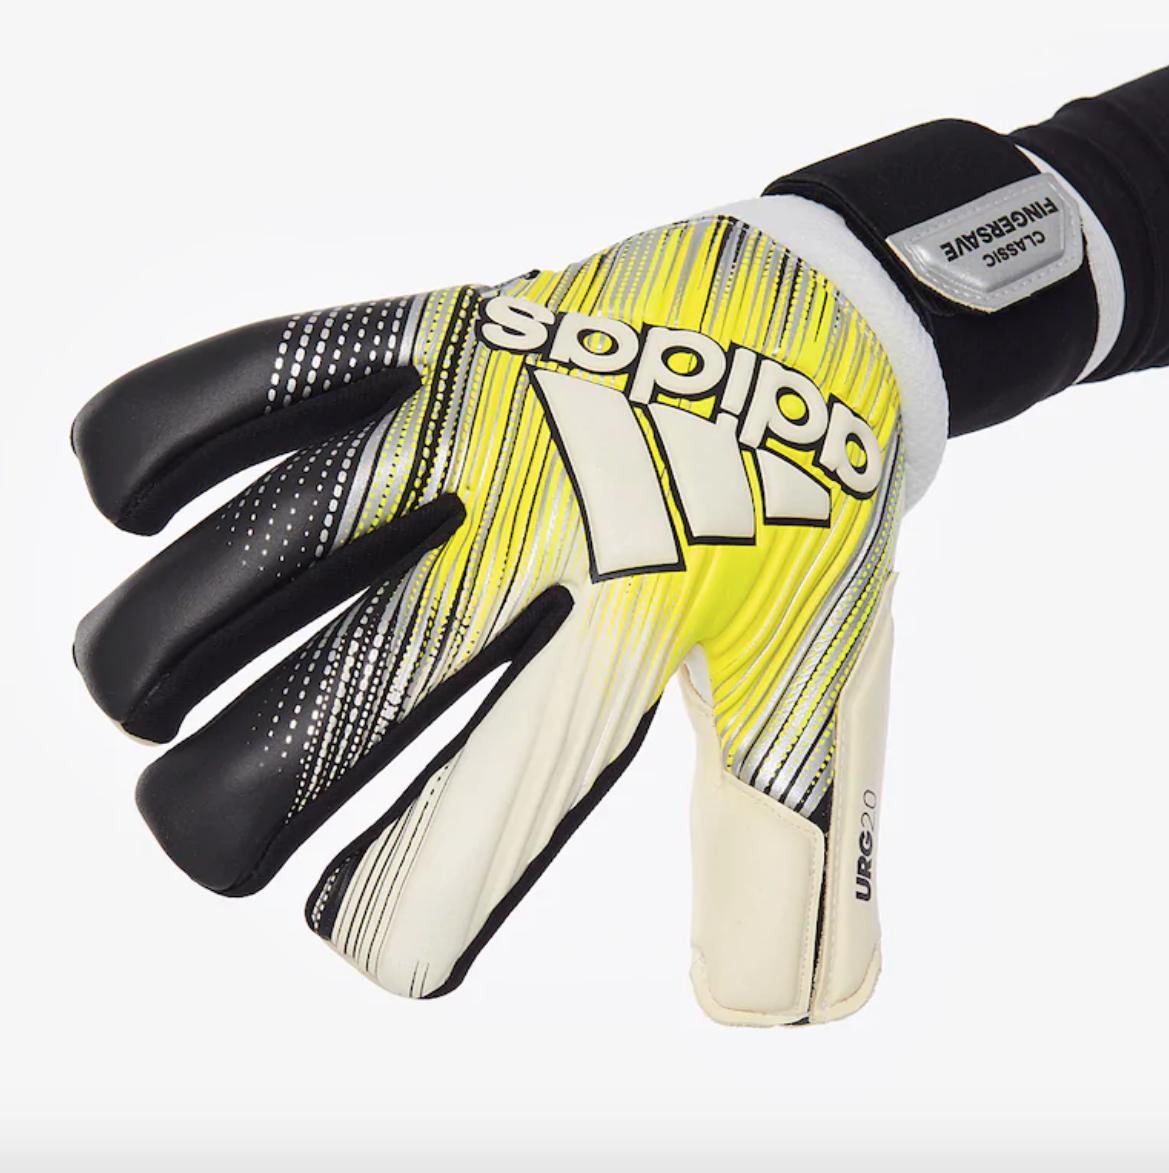 iker-casillas-ligue-des-champions-2000-gants-adidas-5